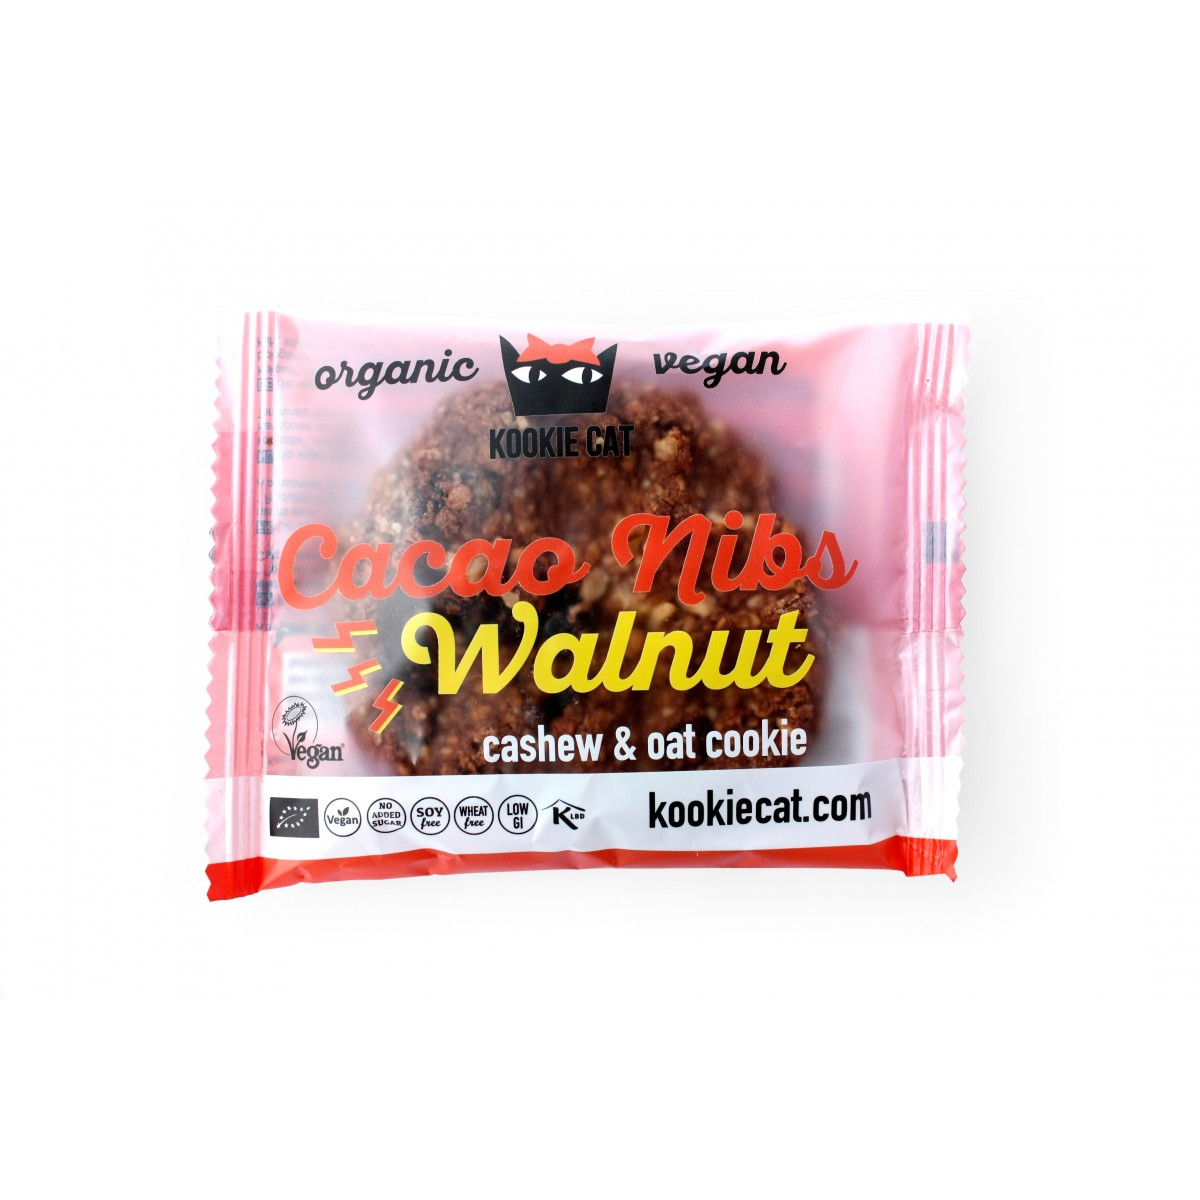 Cacao Nibs Walnut